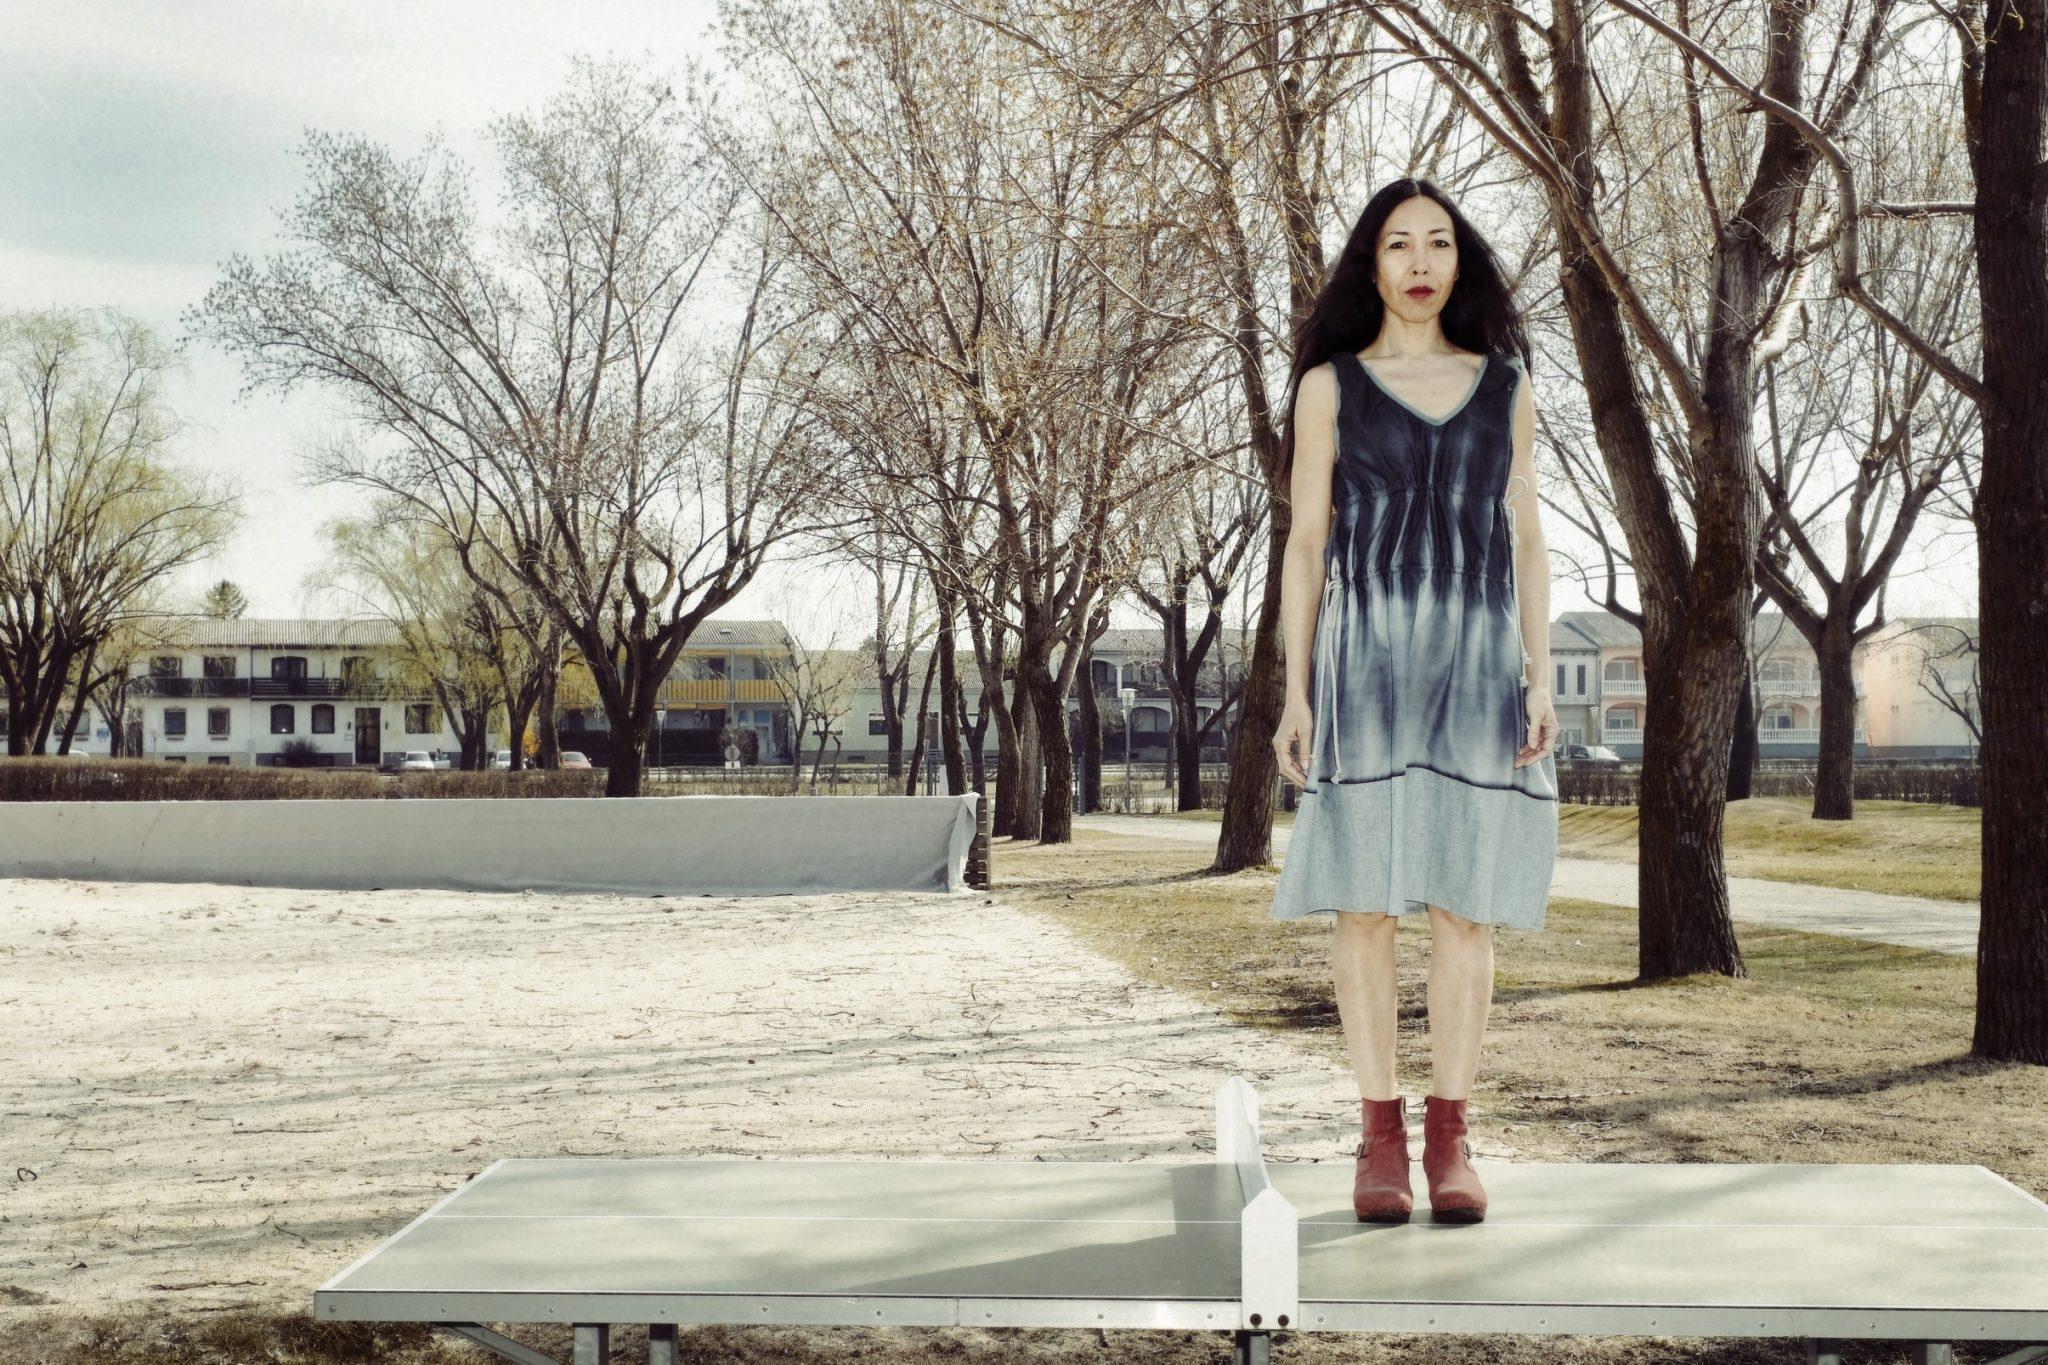 Wienerkleid Spring 19 by Steve Haider (7)_resize